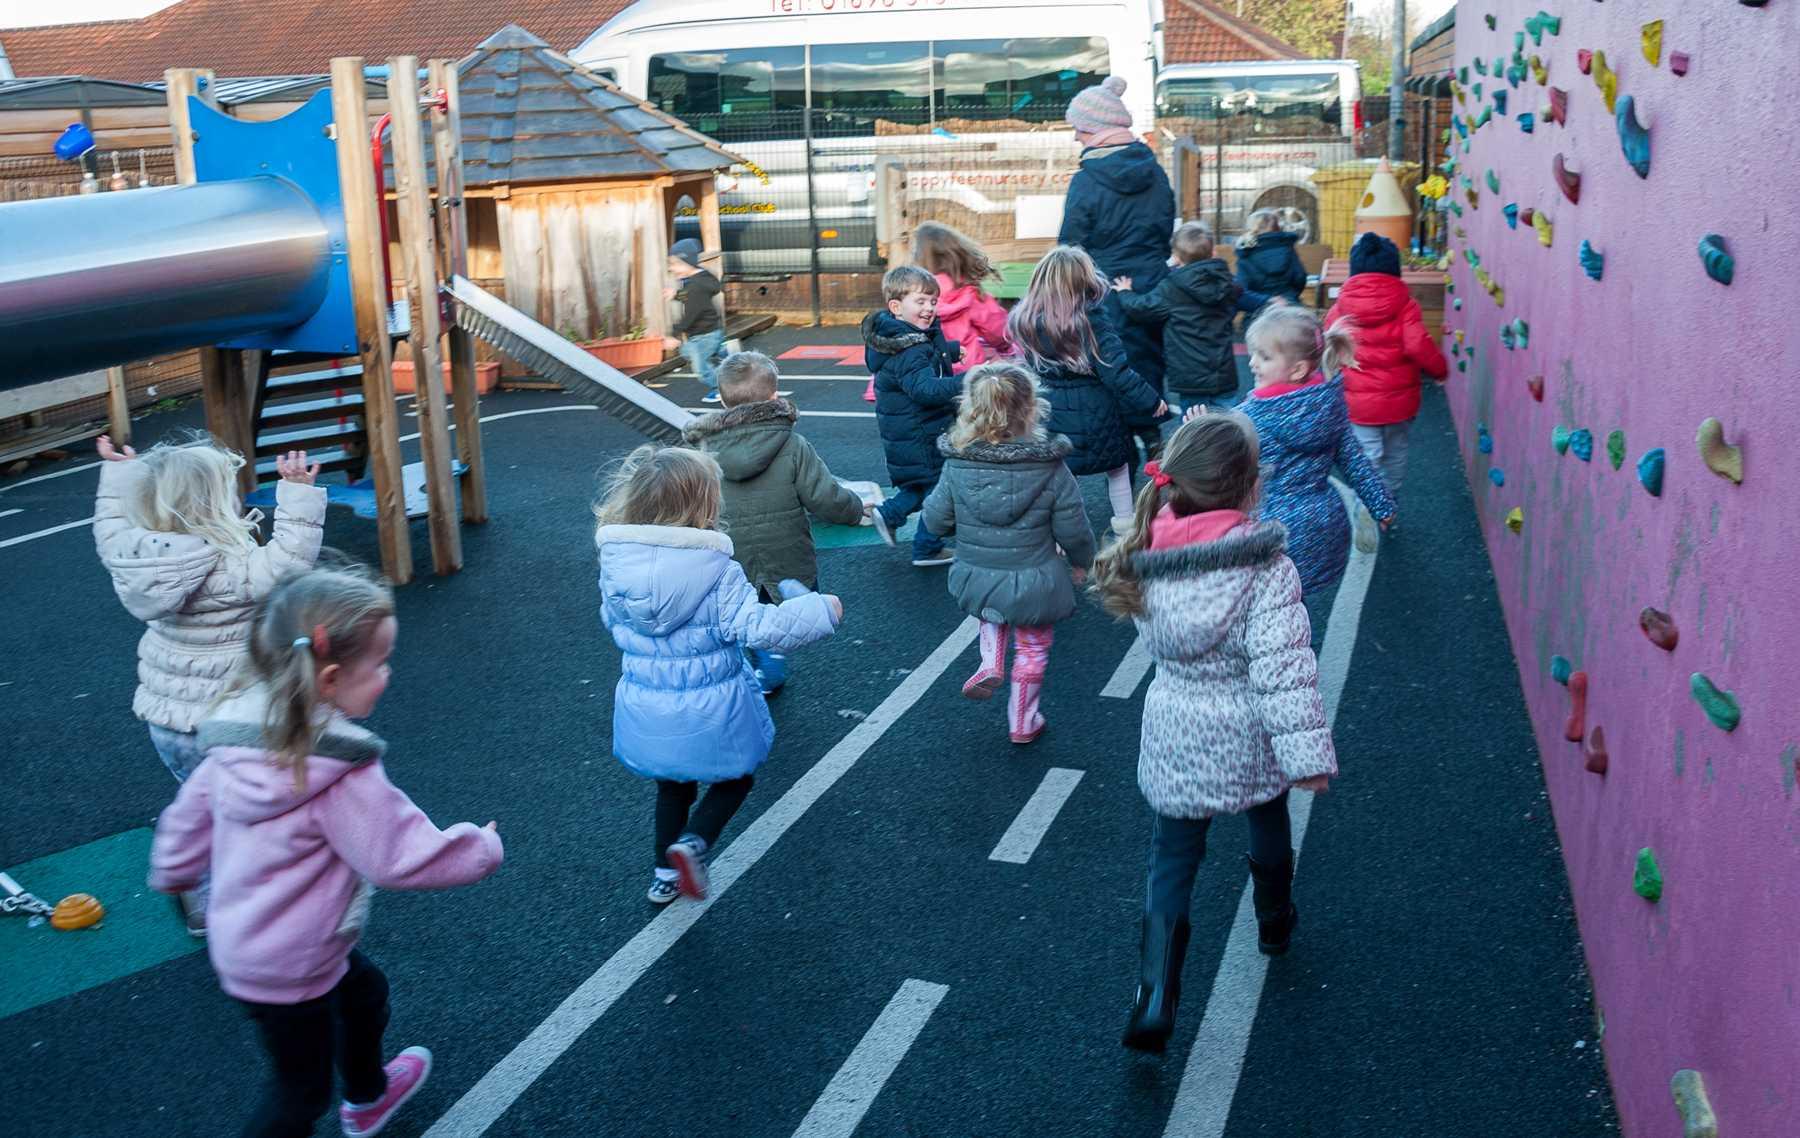 Active Play Area at Happy Feet Nursery - children running